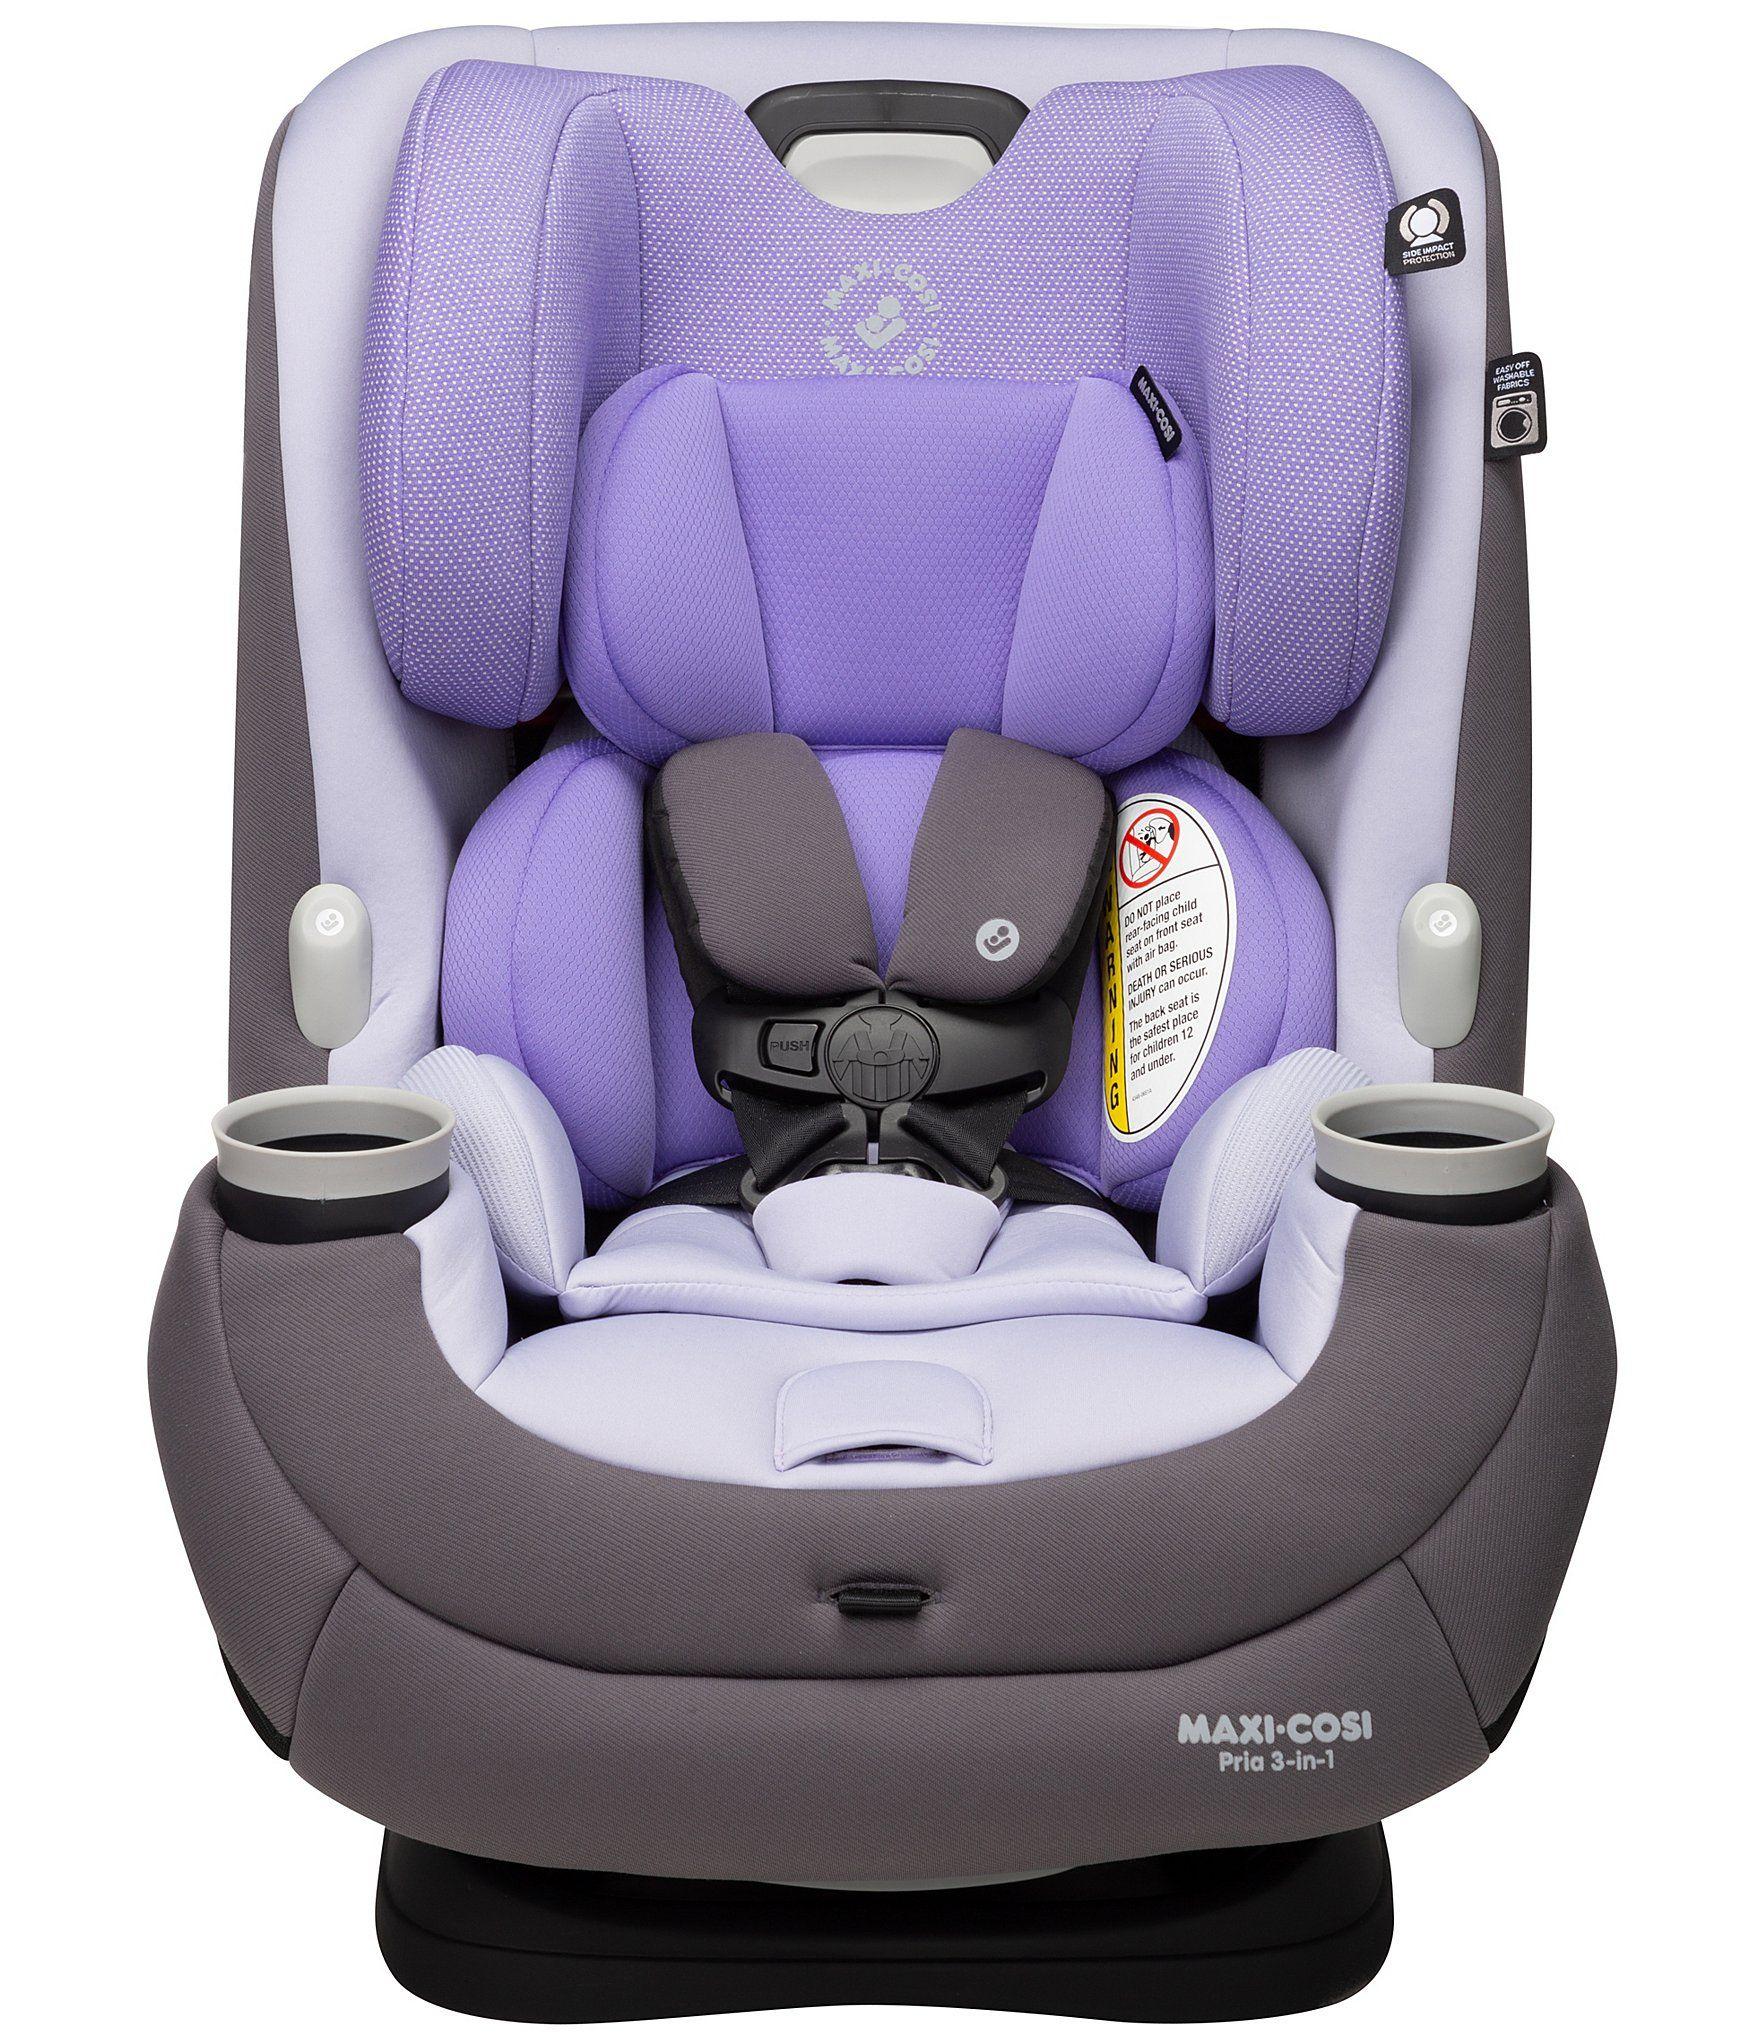 Maxi Cosi Pria 3-in-1 Convertible Car Seat in 2020 | Car ...